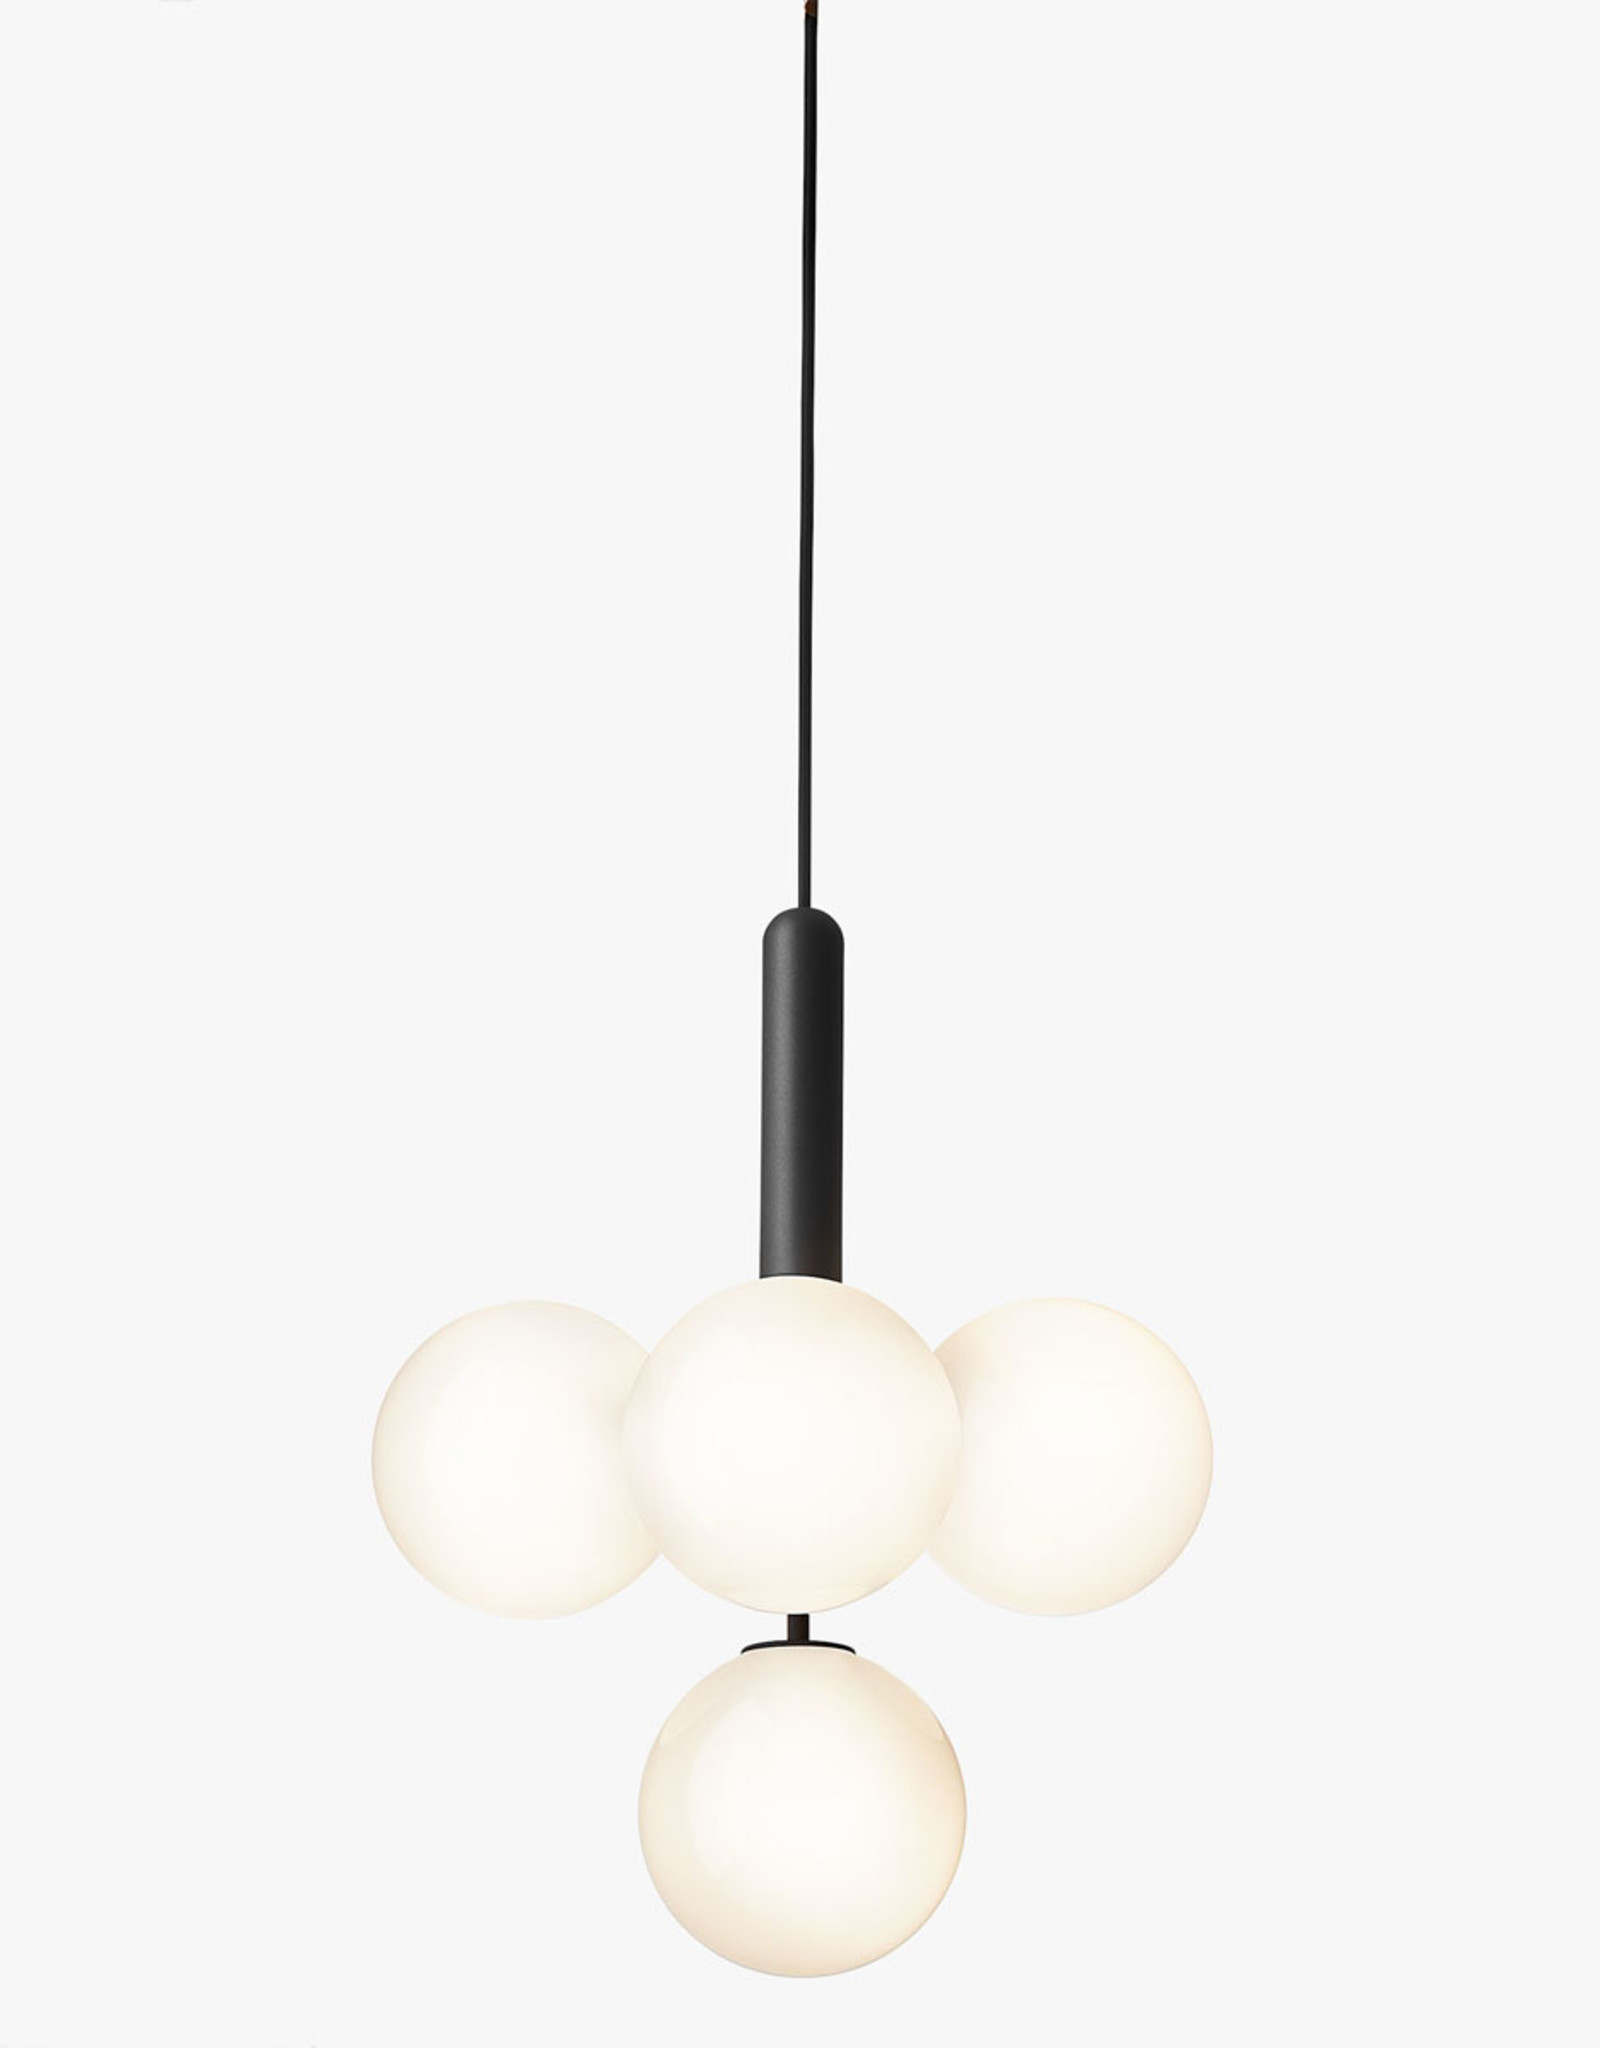 Nuura Miira 4 chandelier by Sofie Refer | Rock grey/opal white